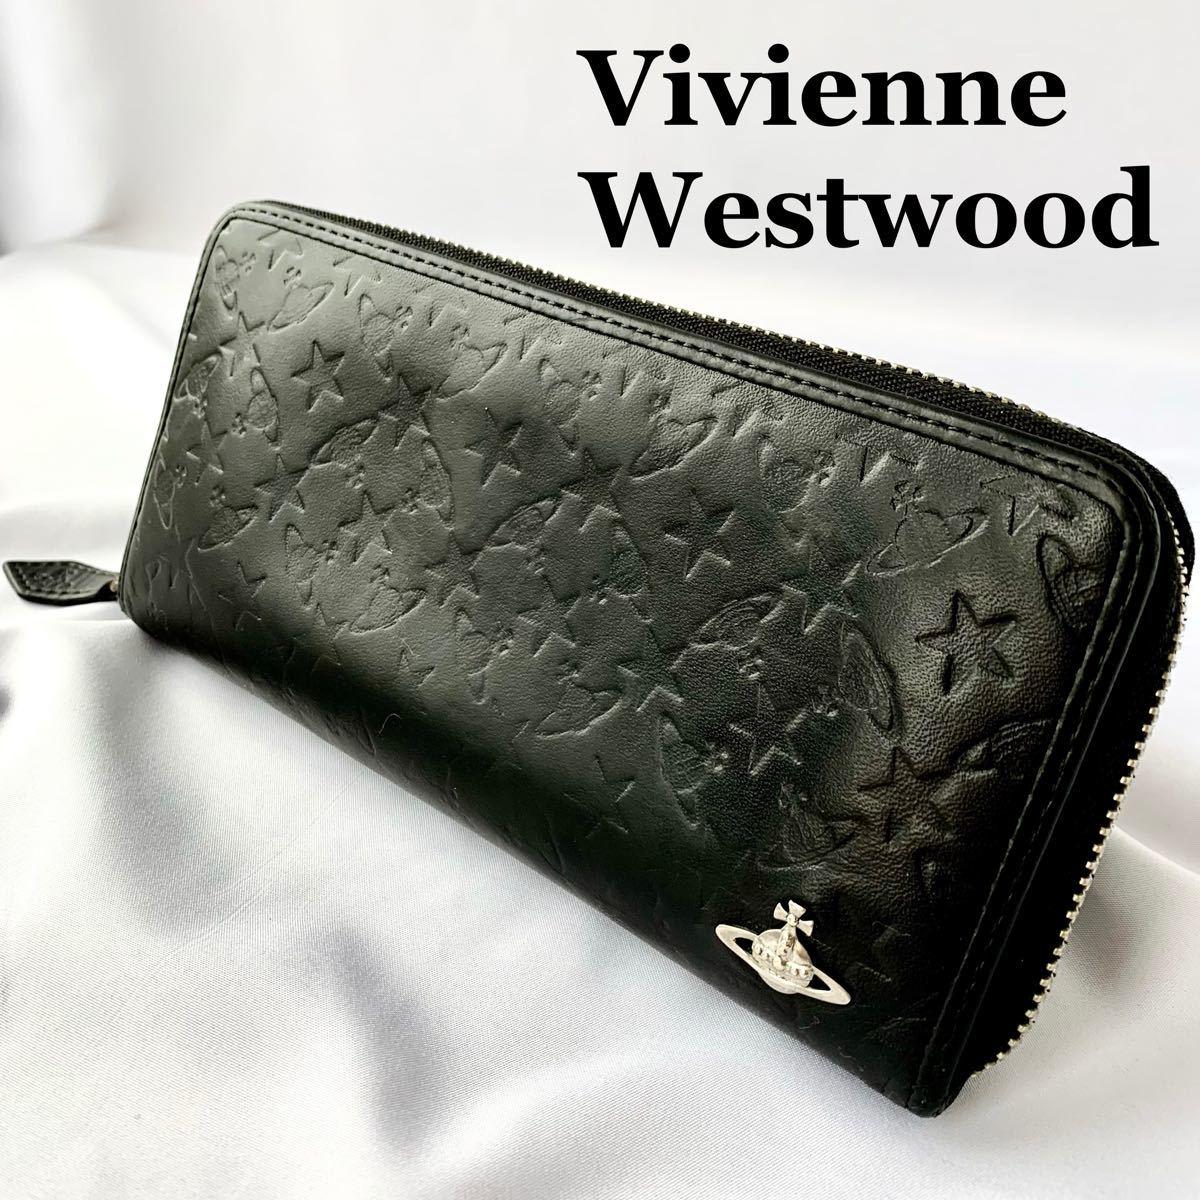 Vivienne Westwood ヴィヴィアンウエストウッド 長財布 オーブ ラウンドファスナー ブラック レザー オーブ柄